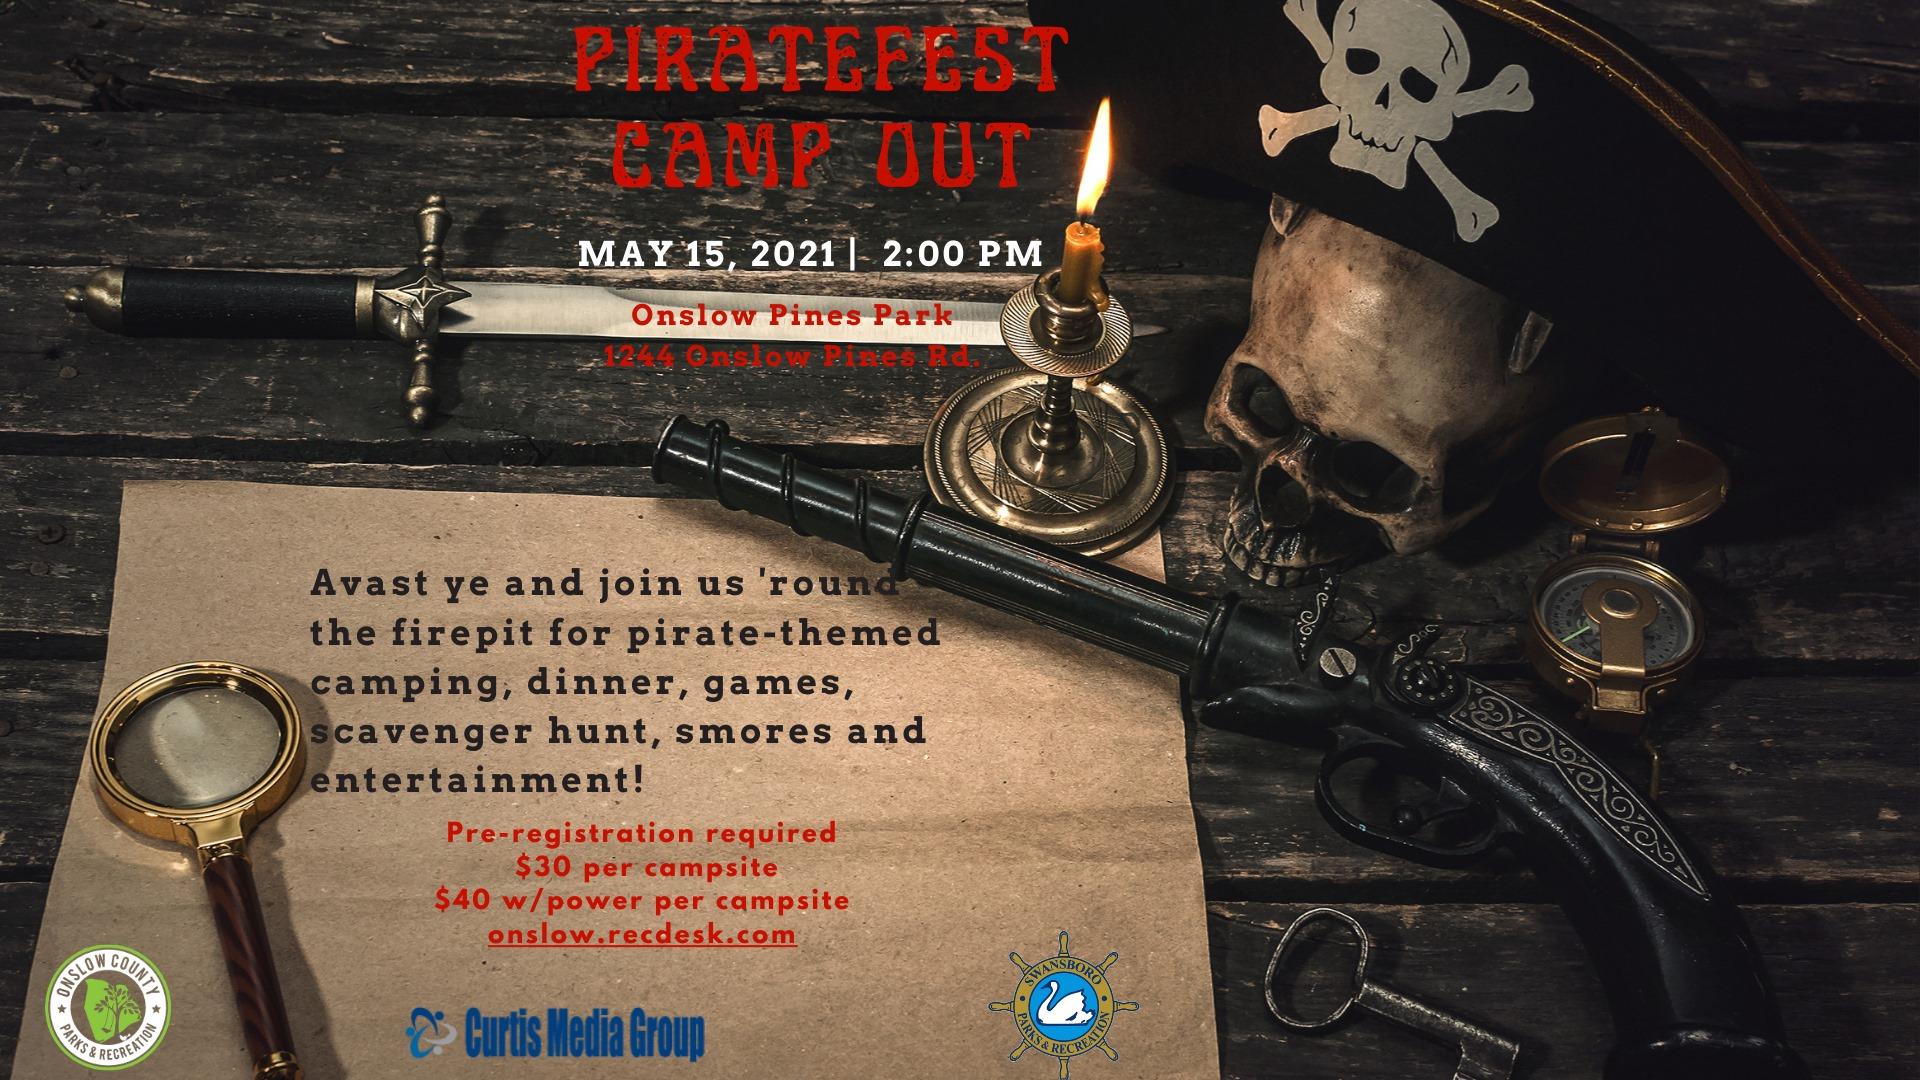 Piratefest Family Campout